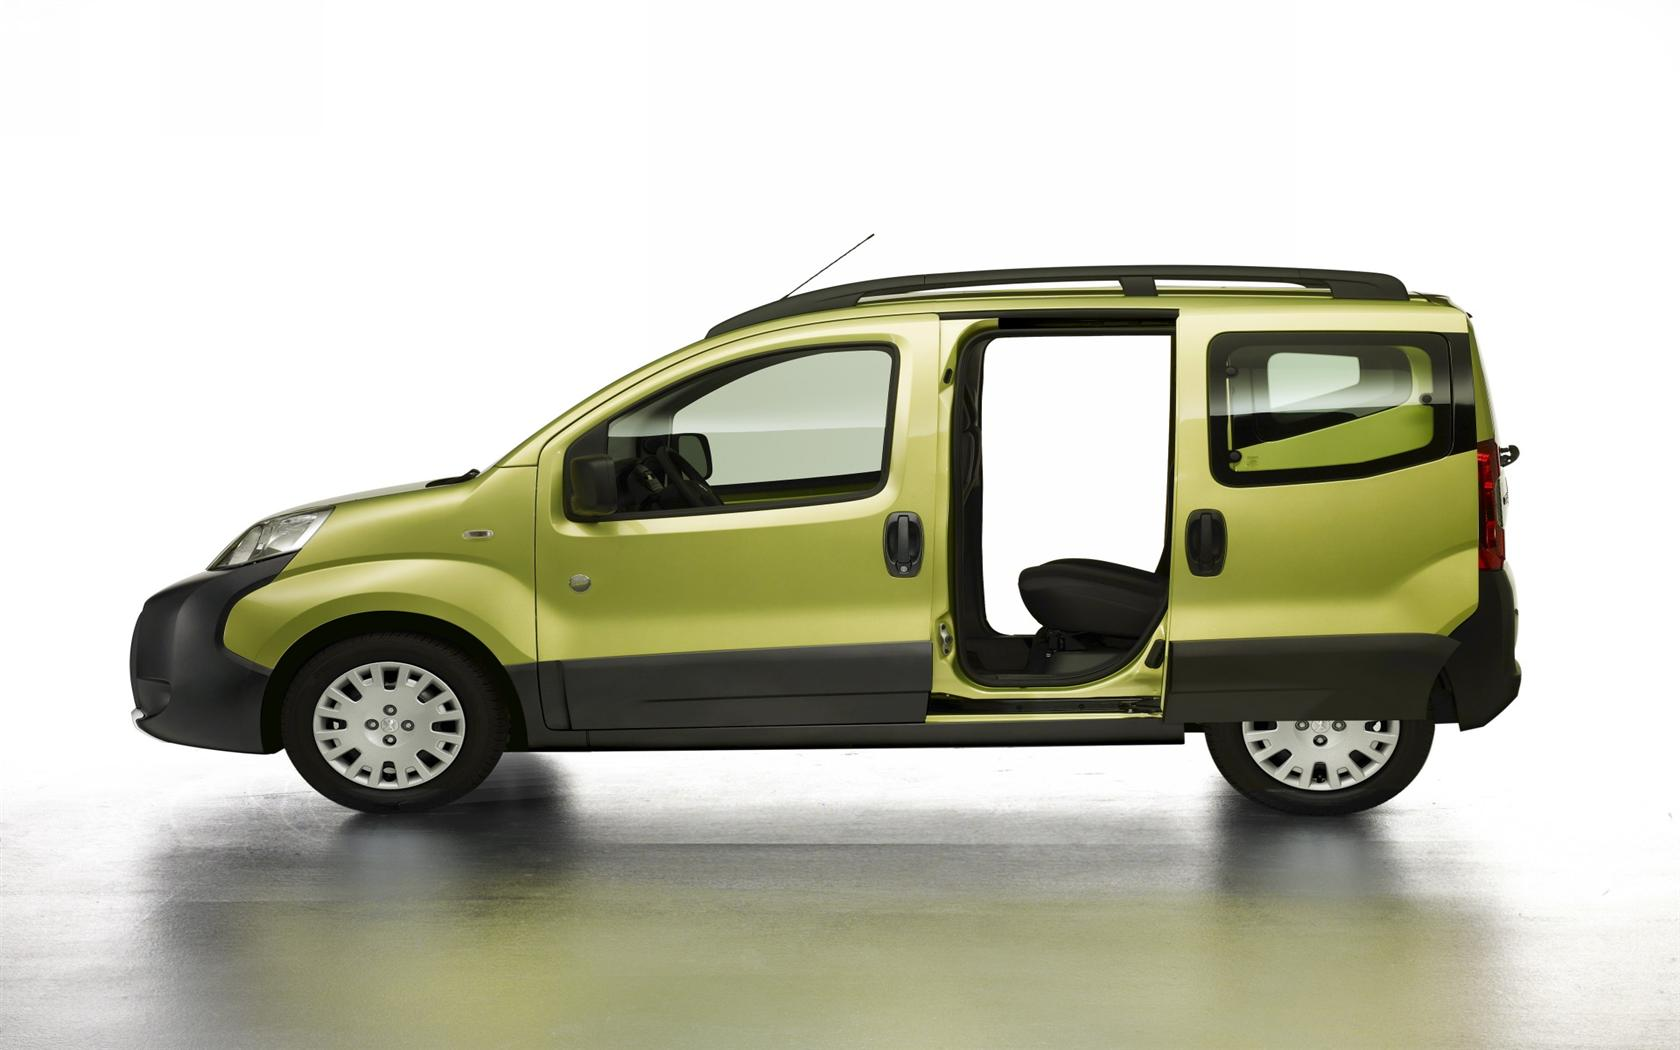 peugeot bipper tepee photos reviews news specs buy car. Black Bedroom Furniture Sets. Home Design Ideas